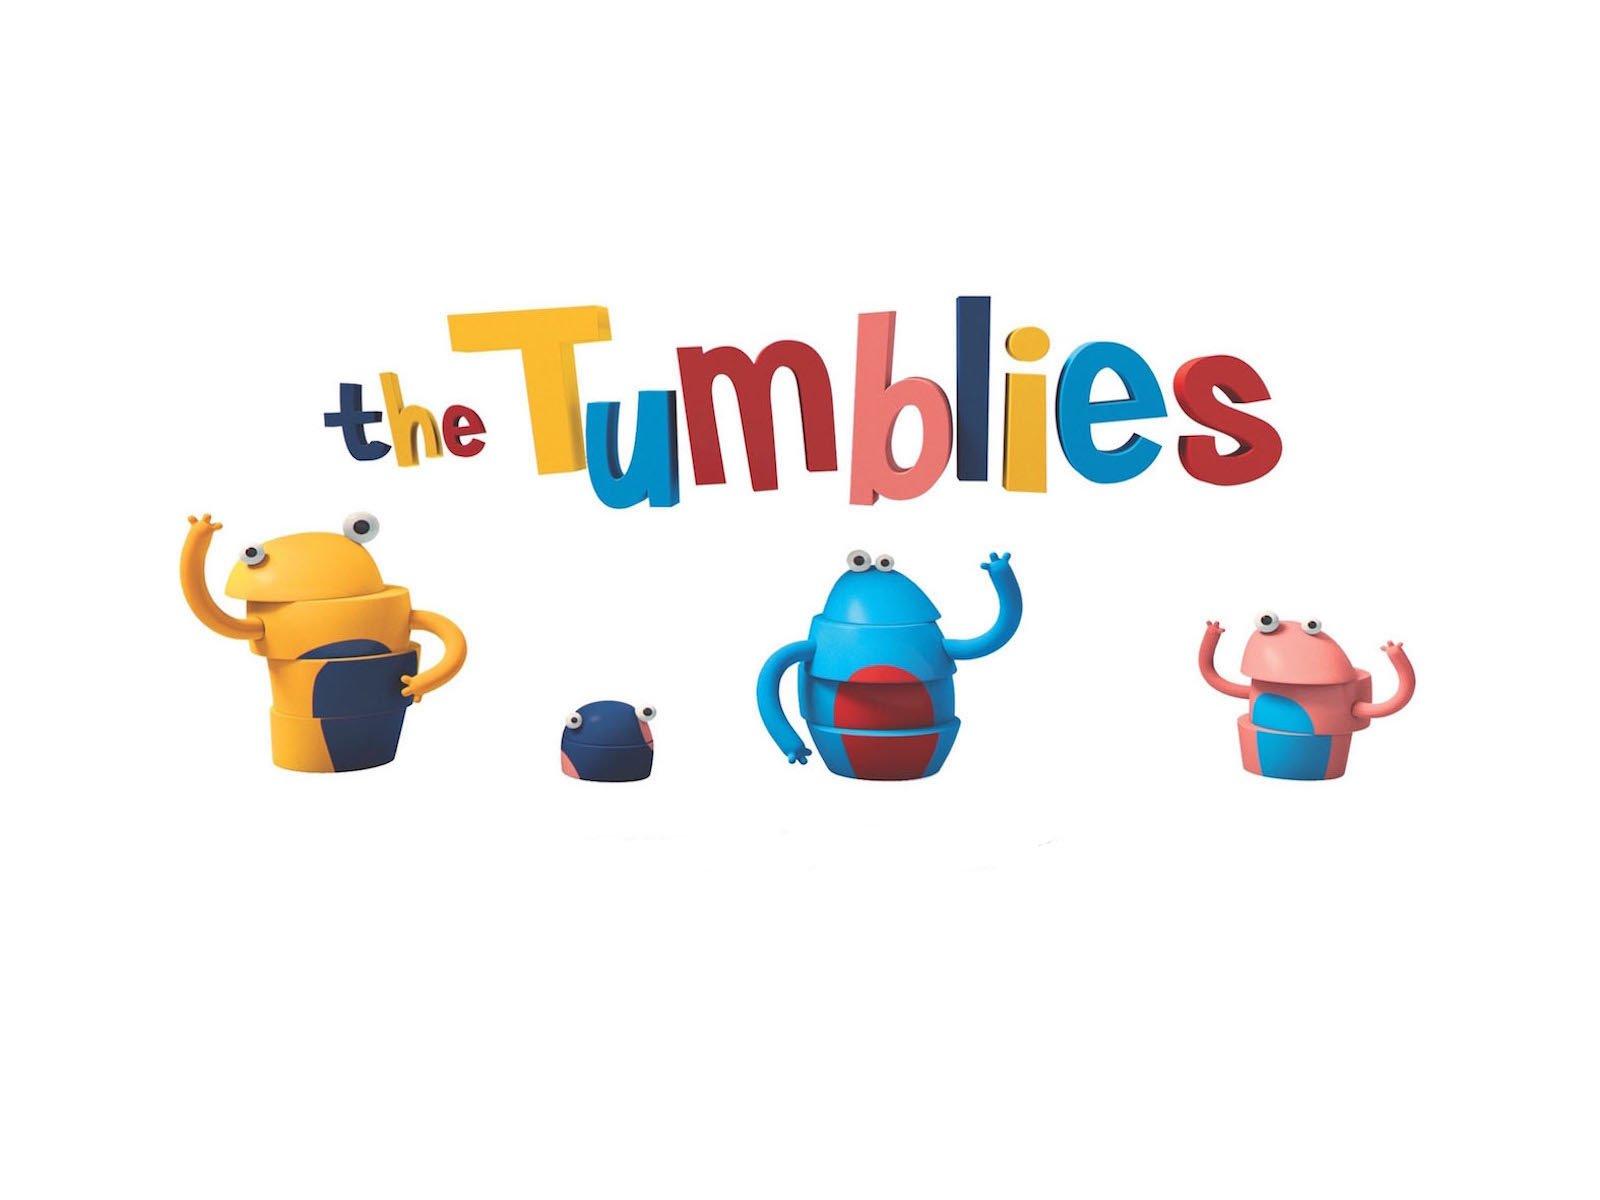 Amazon.com: The Tumblies: Patrick Raats, Joris & Marieke Job ...